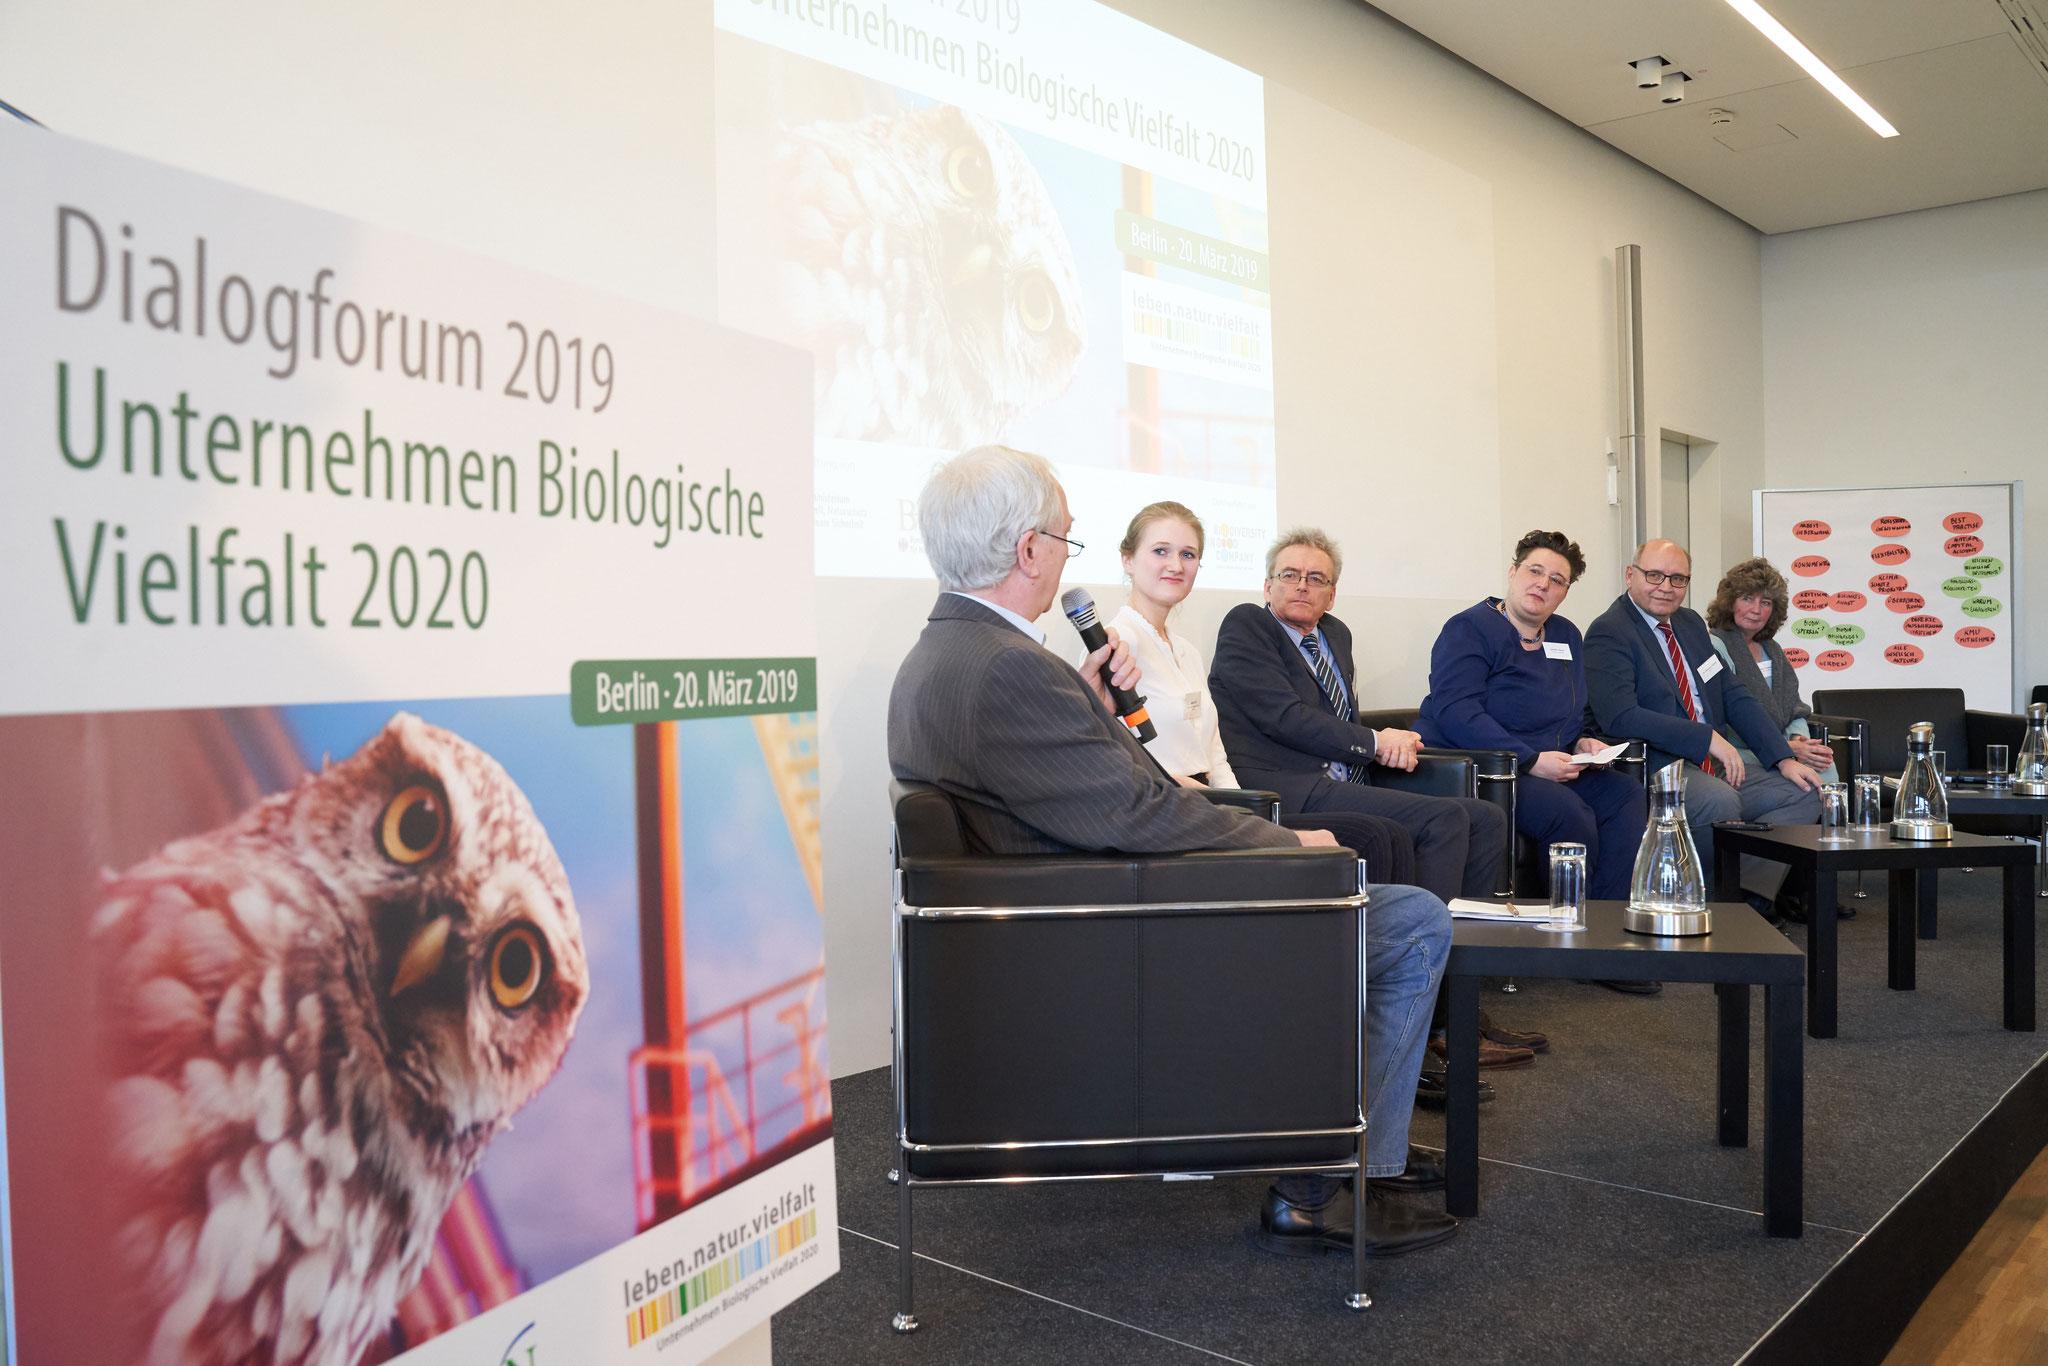 Dialogforum 2019 UBi 2020, Bild: F. Nürnberger für 'Biodiversity in Good Company' Initiative